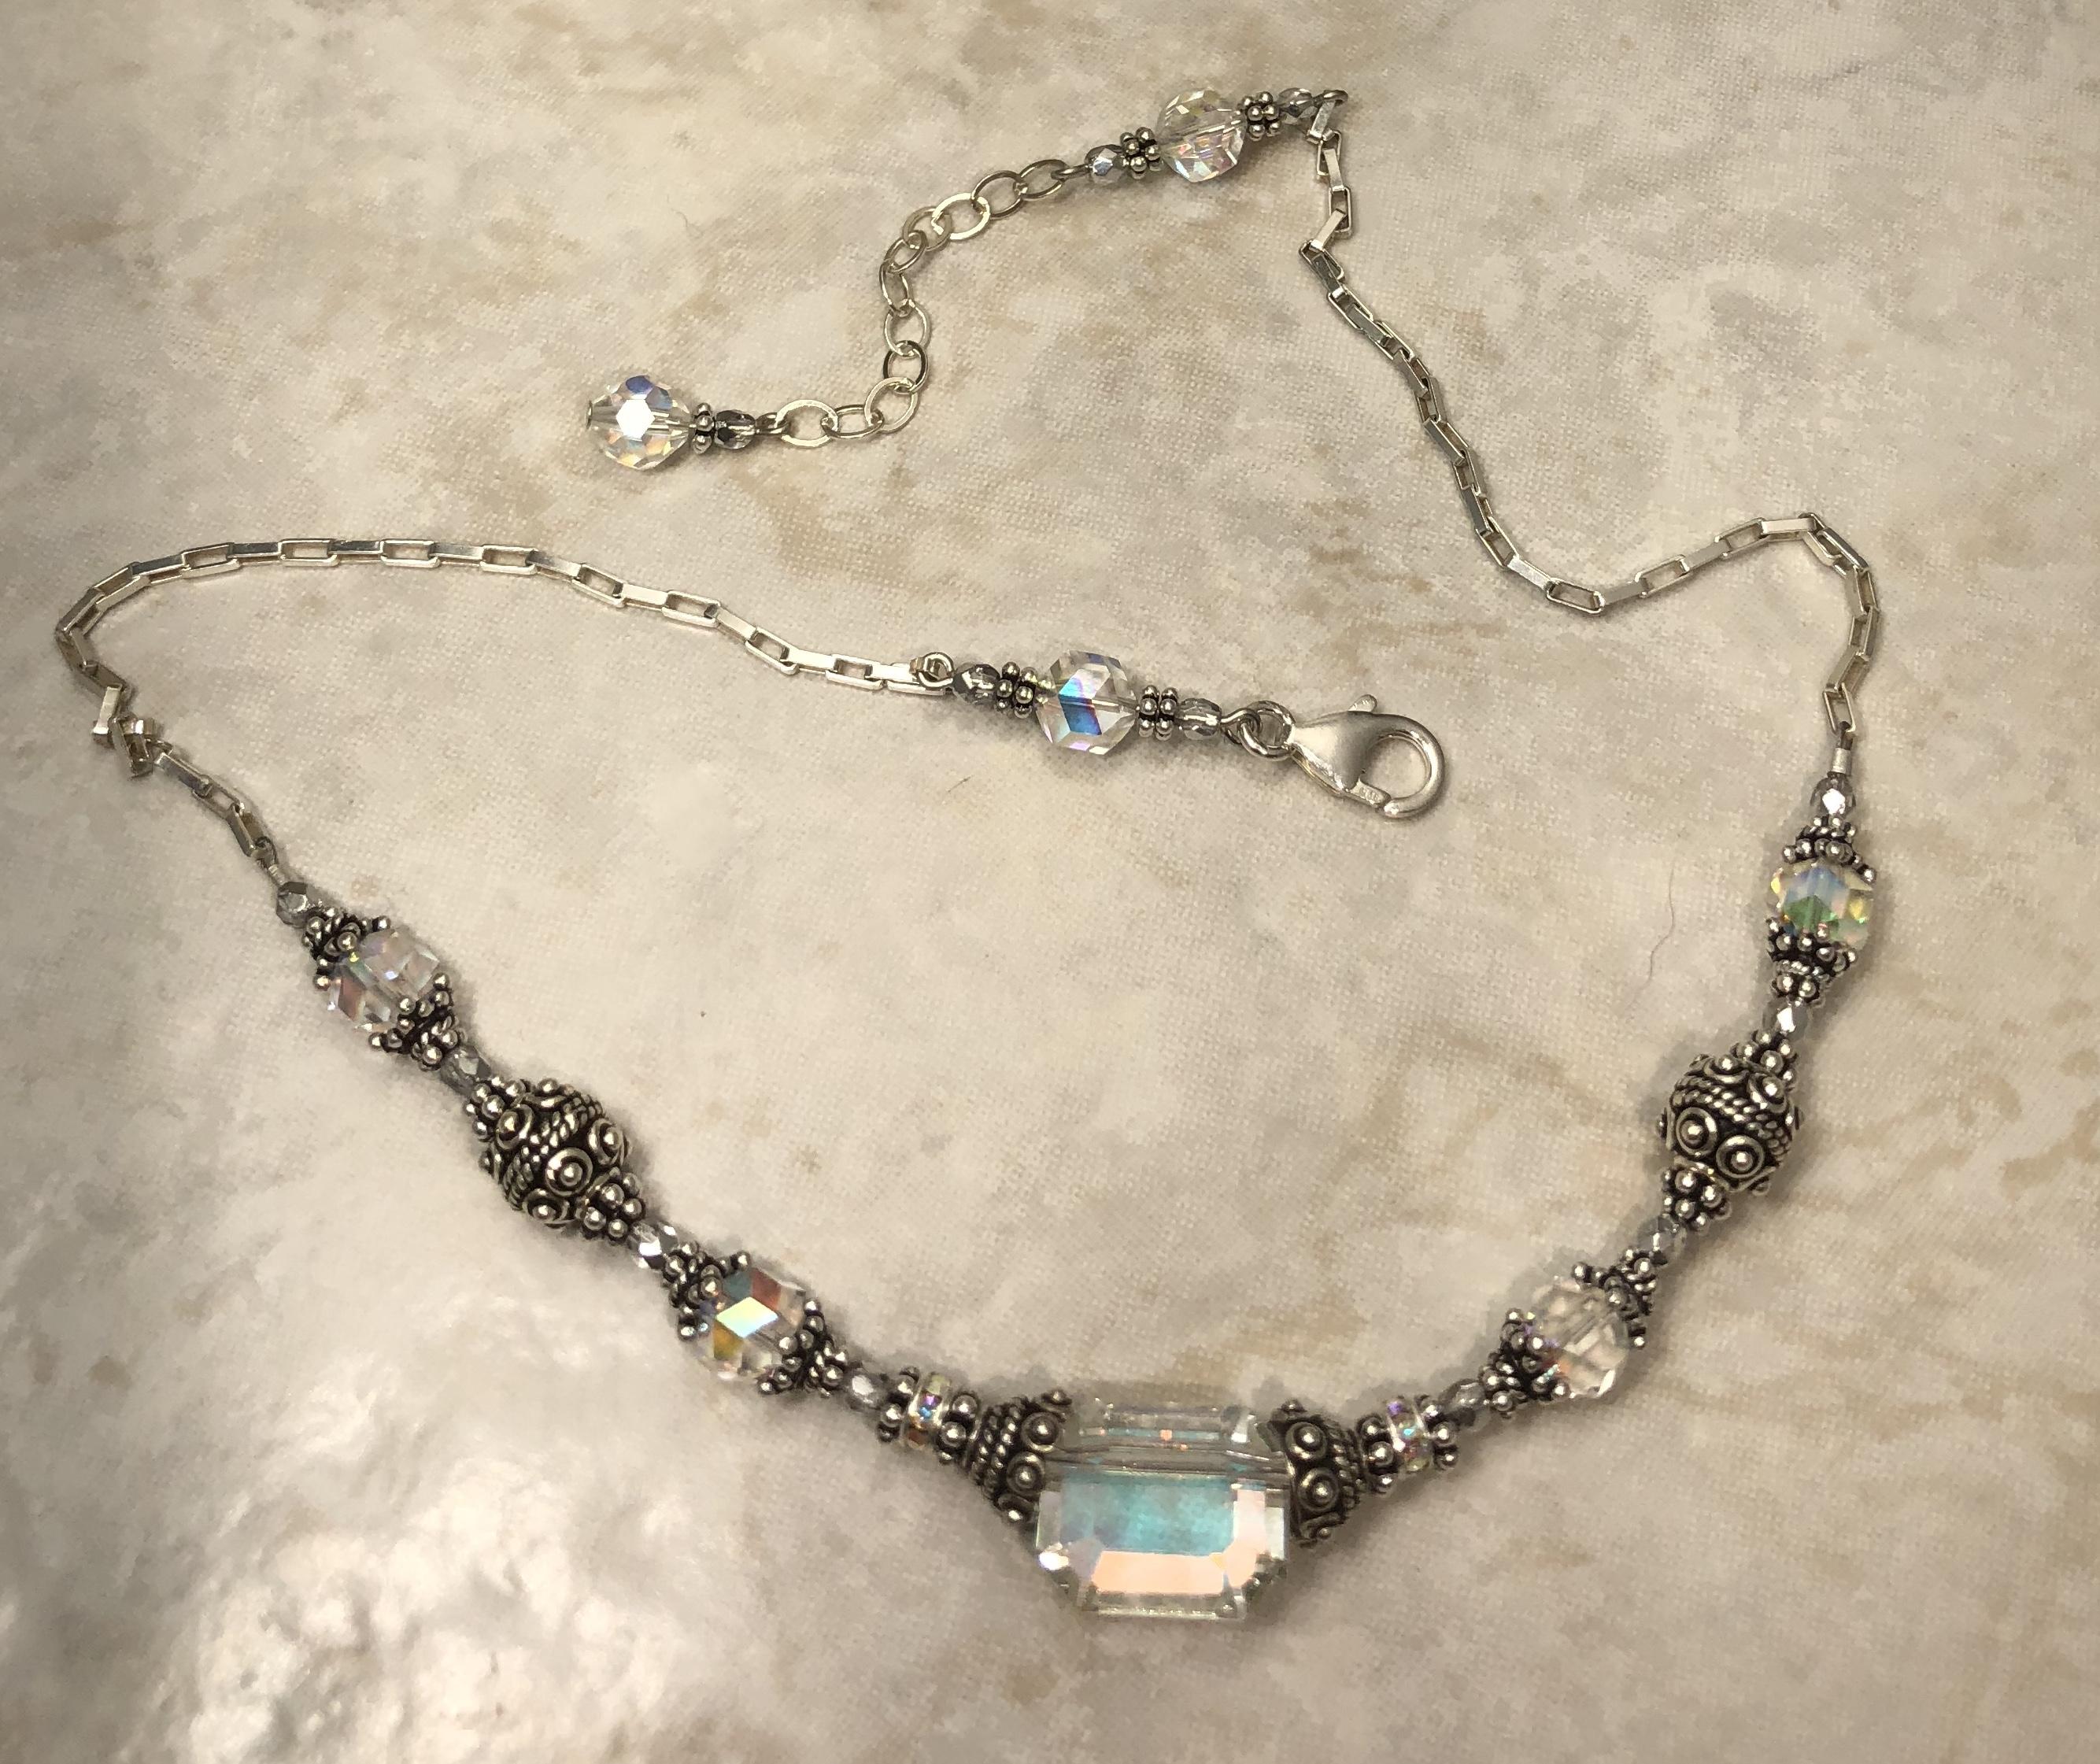 891e293156f33 Aurora Borealis Angles Vintage Swarovski Crystal Necklace by Sue Shefts  Designs